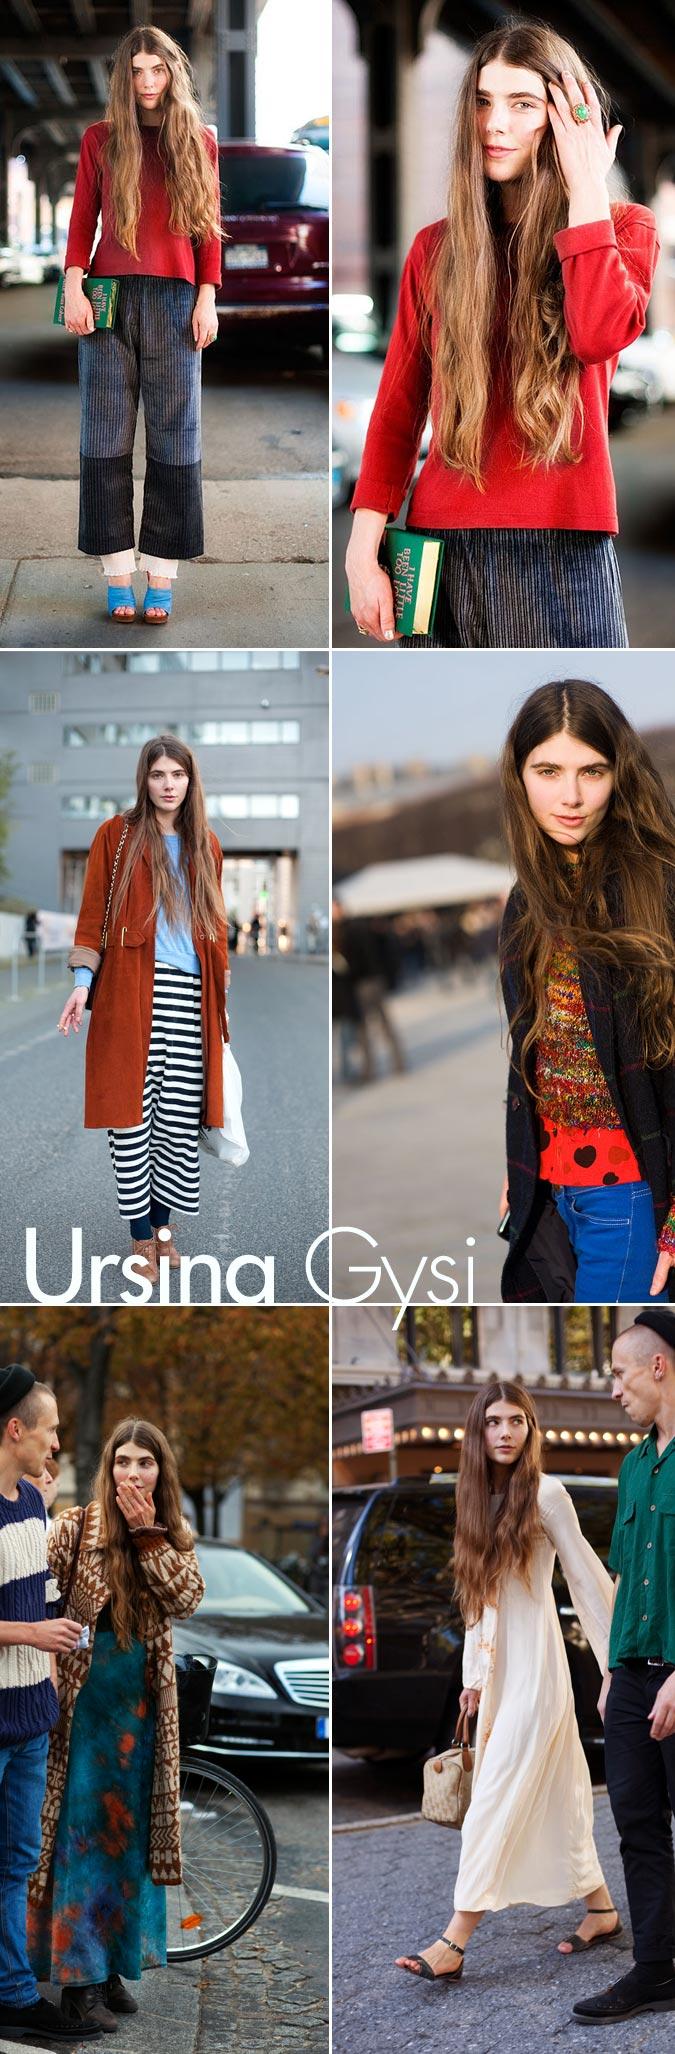 Style File: Ursina Gysi